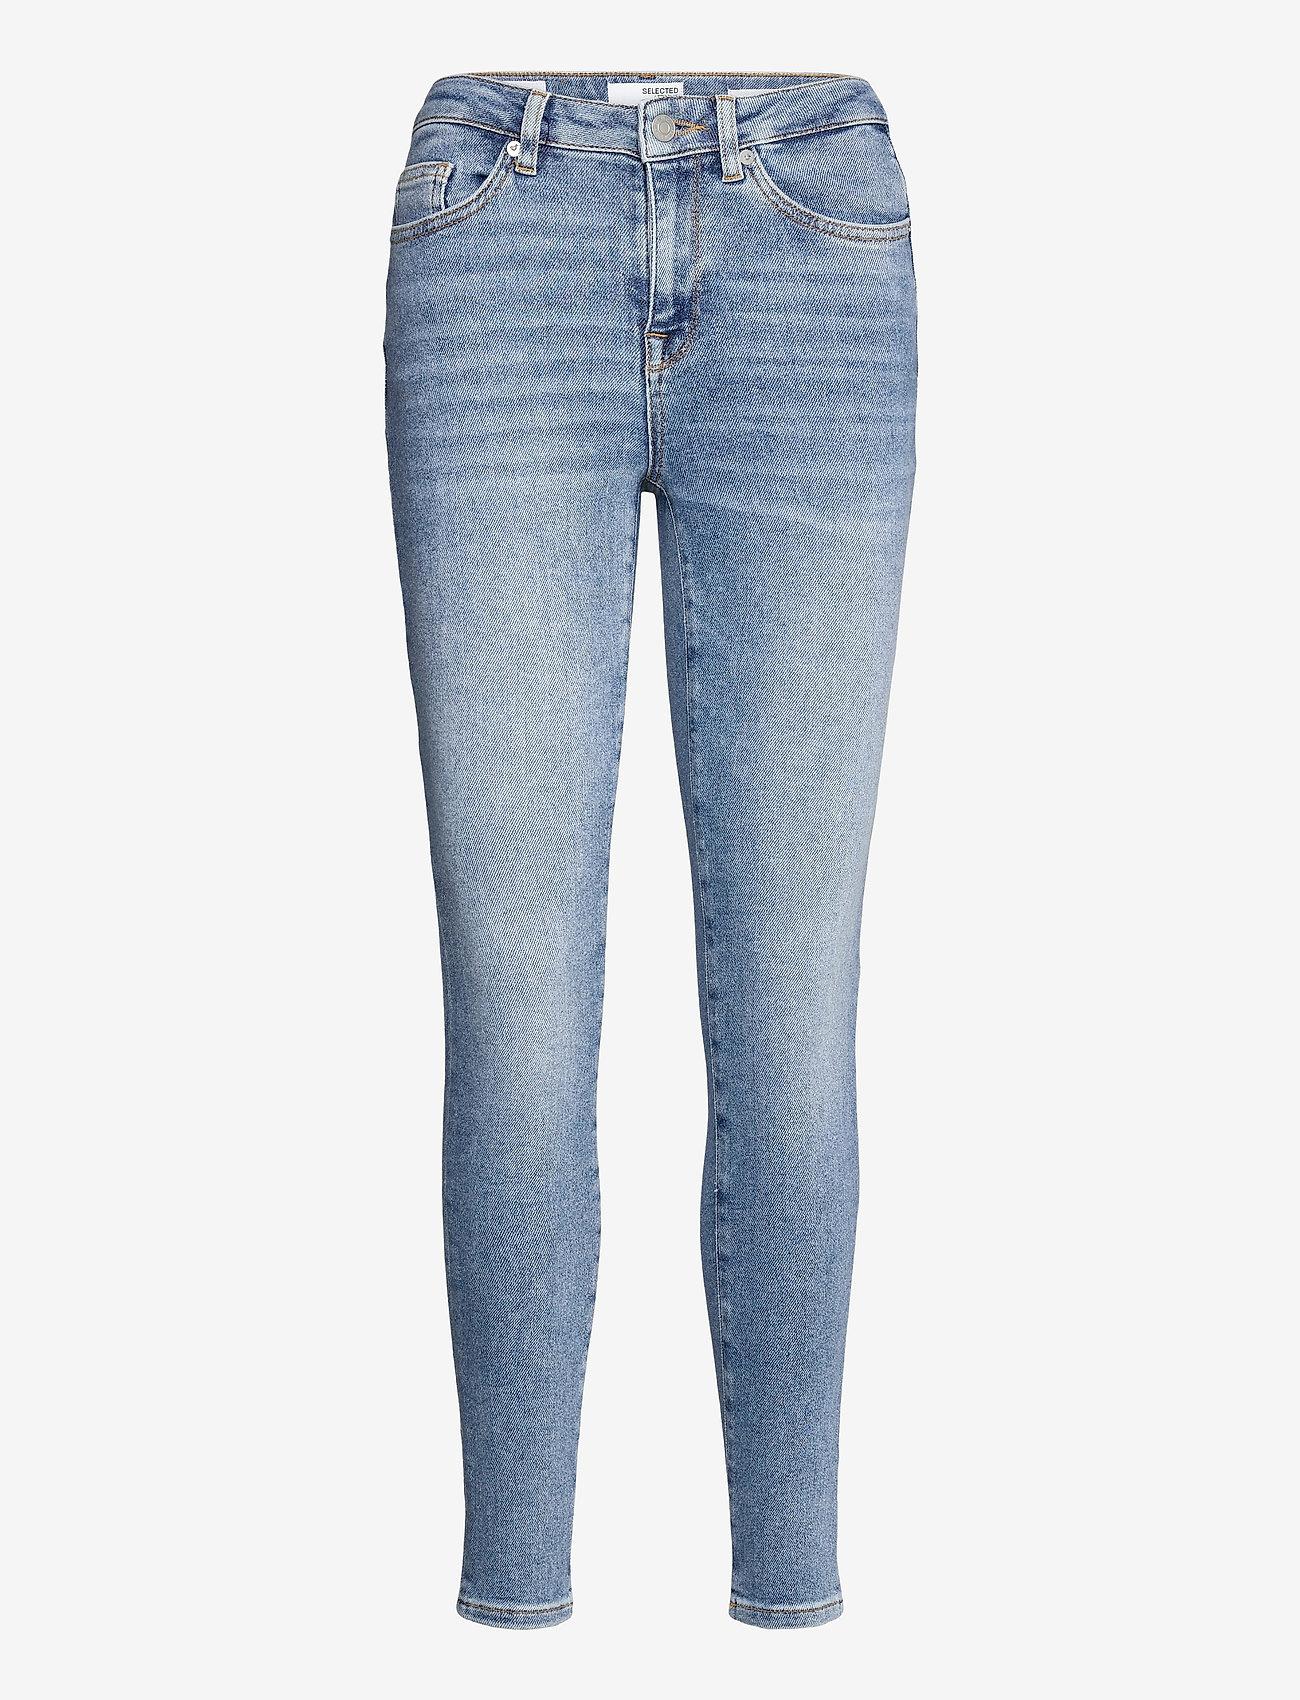 Selected Femme - SLFSOPHIA MW SKINNY MIDLUE JEAN U - skinny jeans - medium blue denim - 0